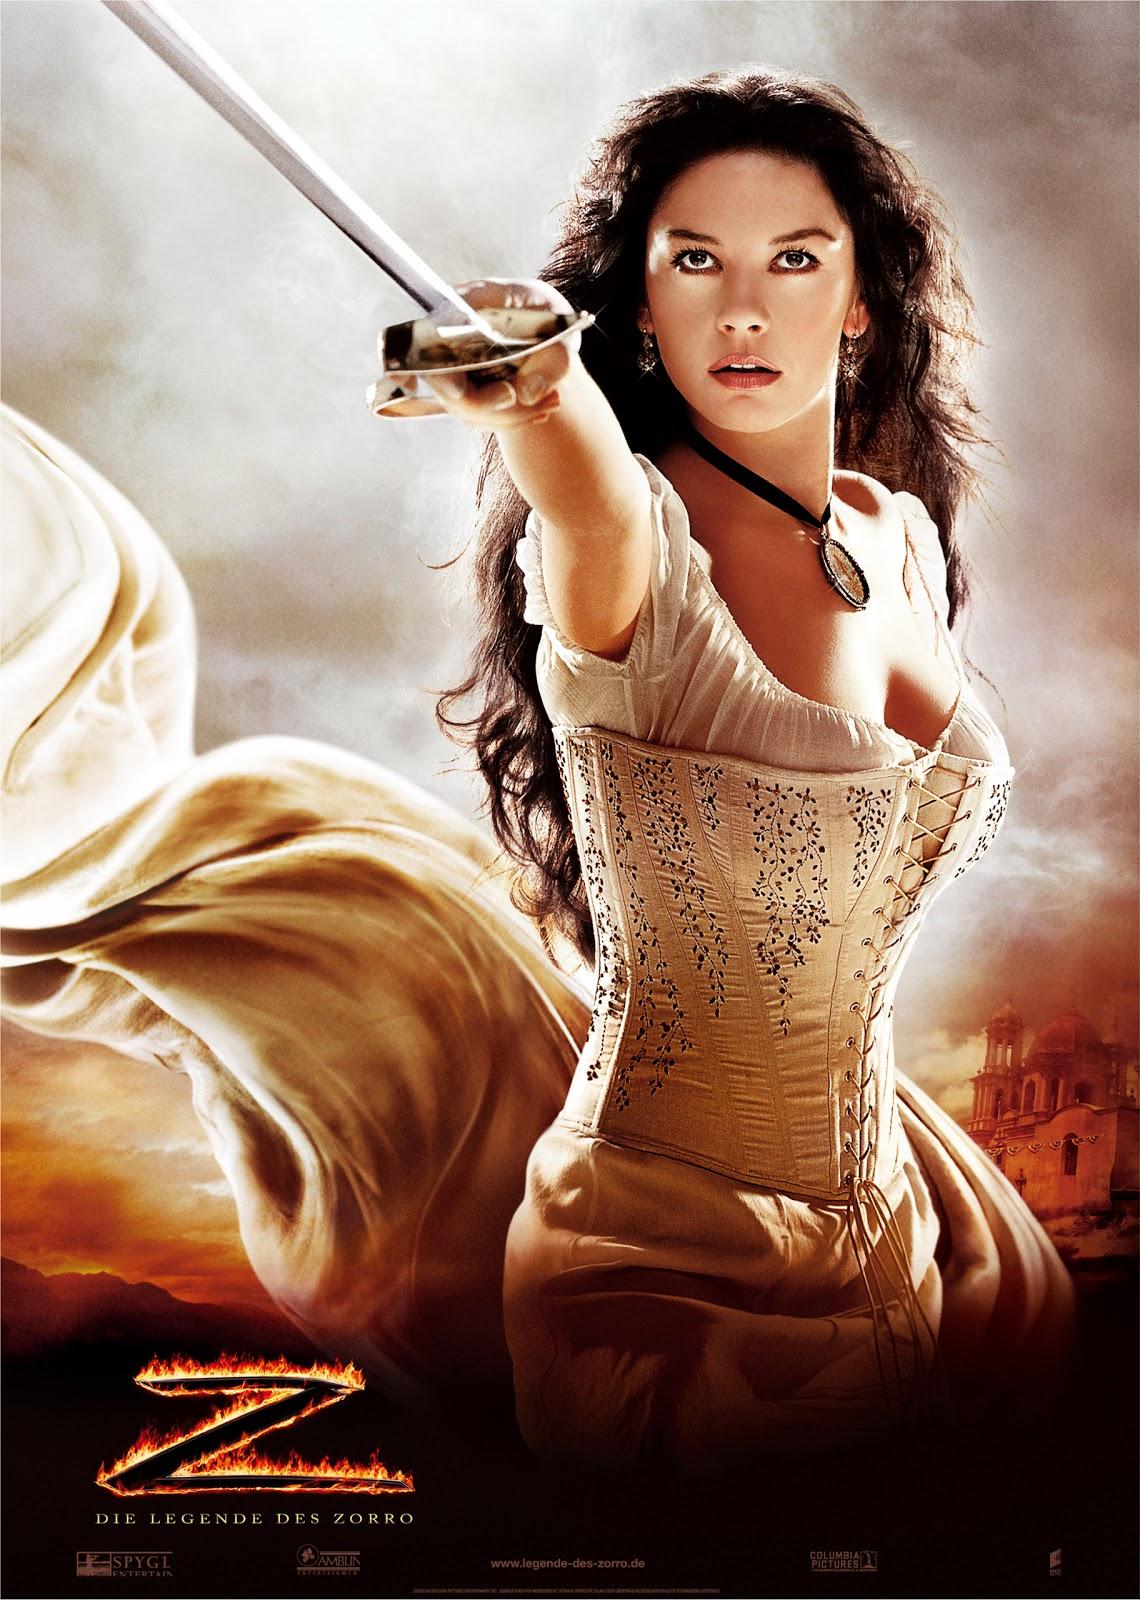 The Legend of Zorro full movie